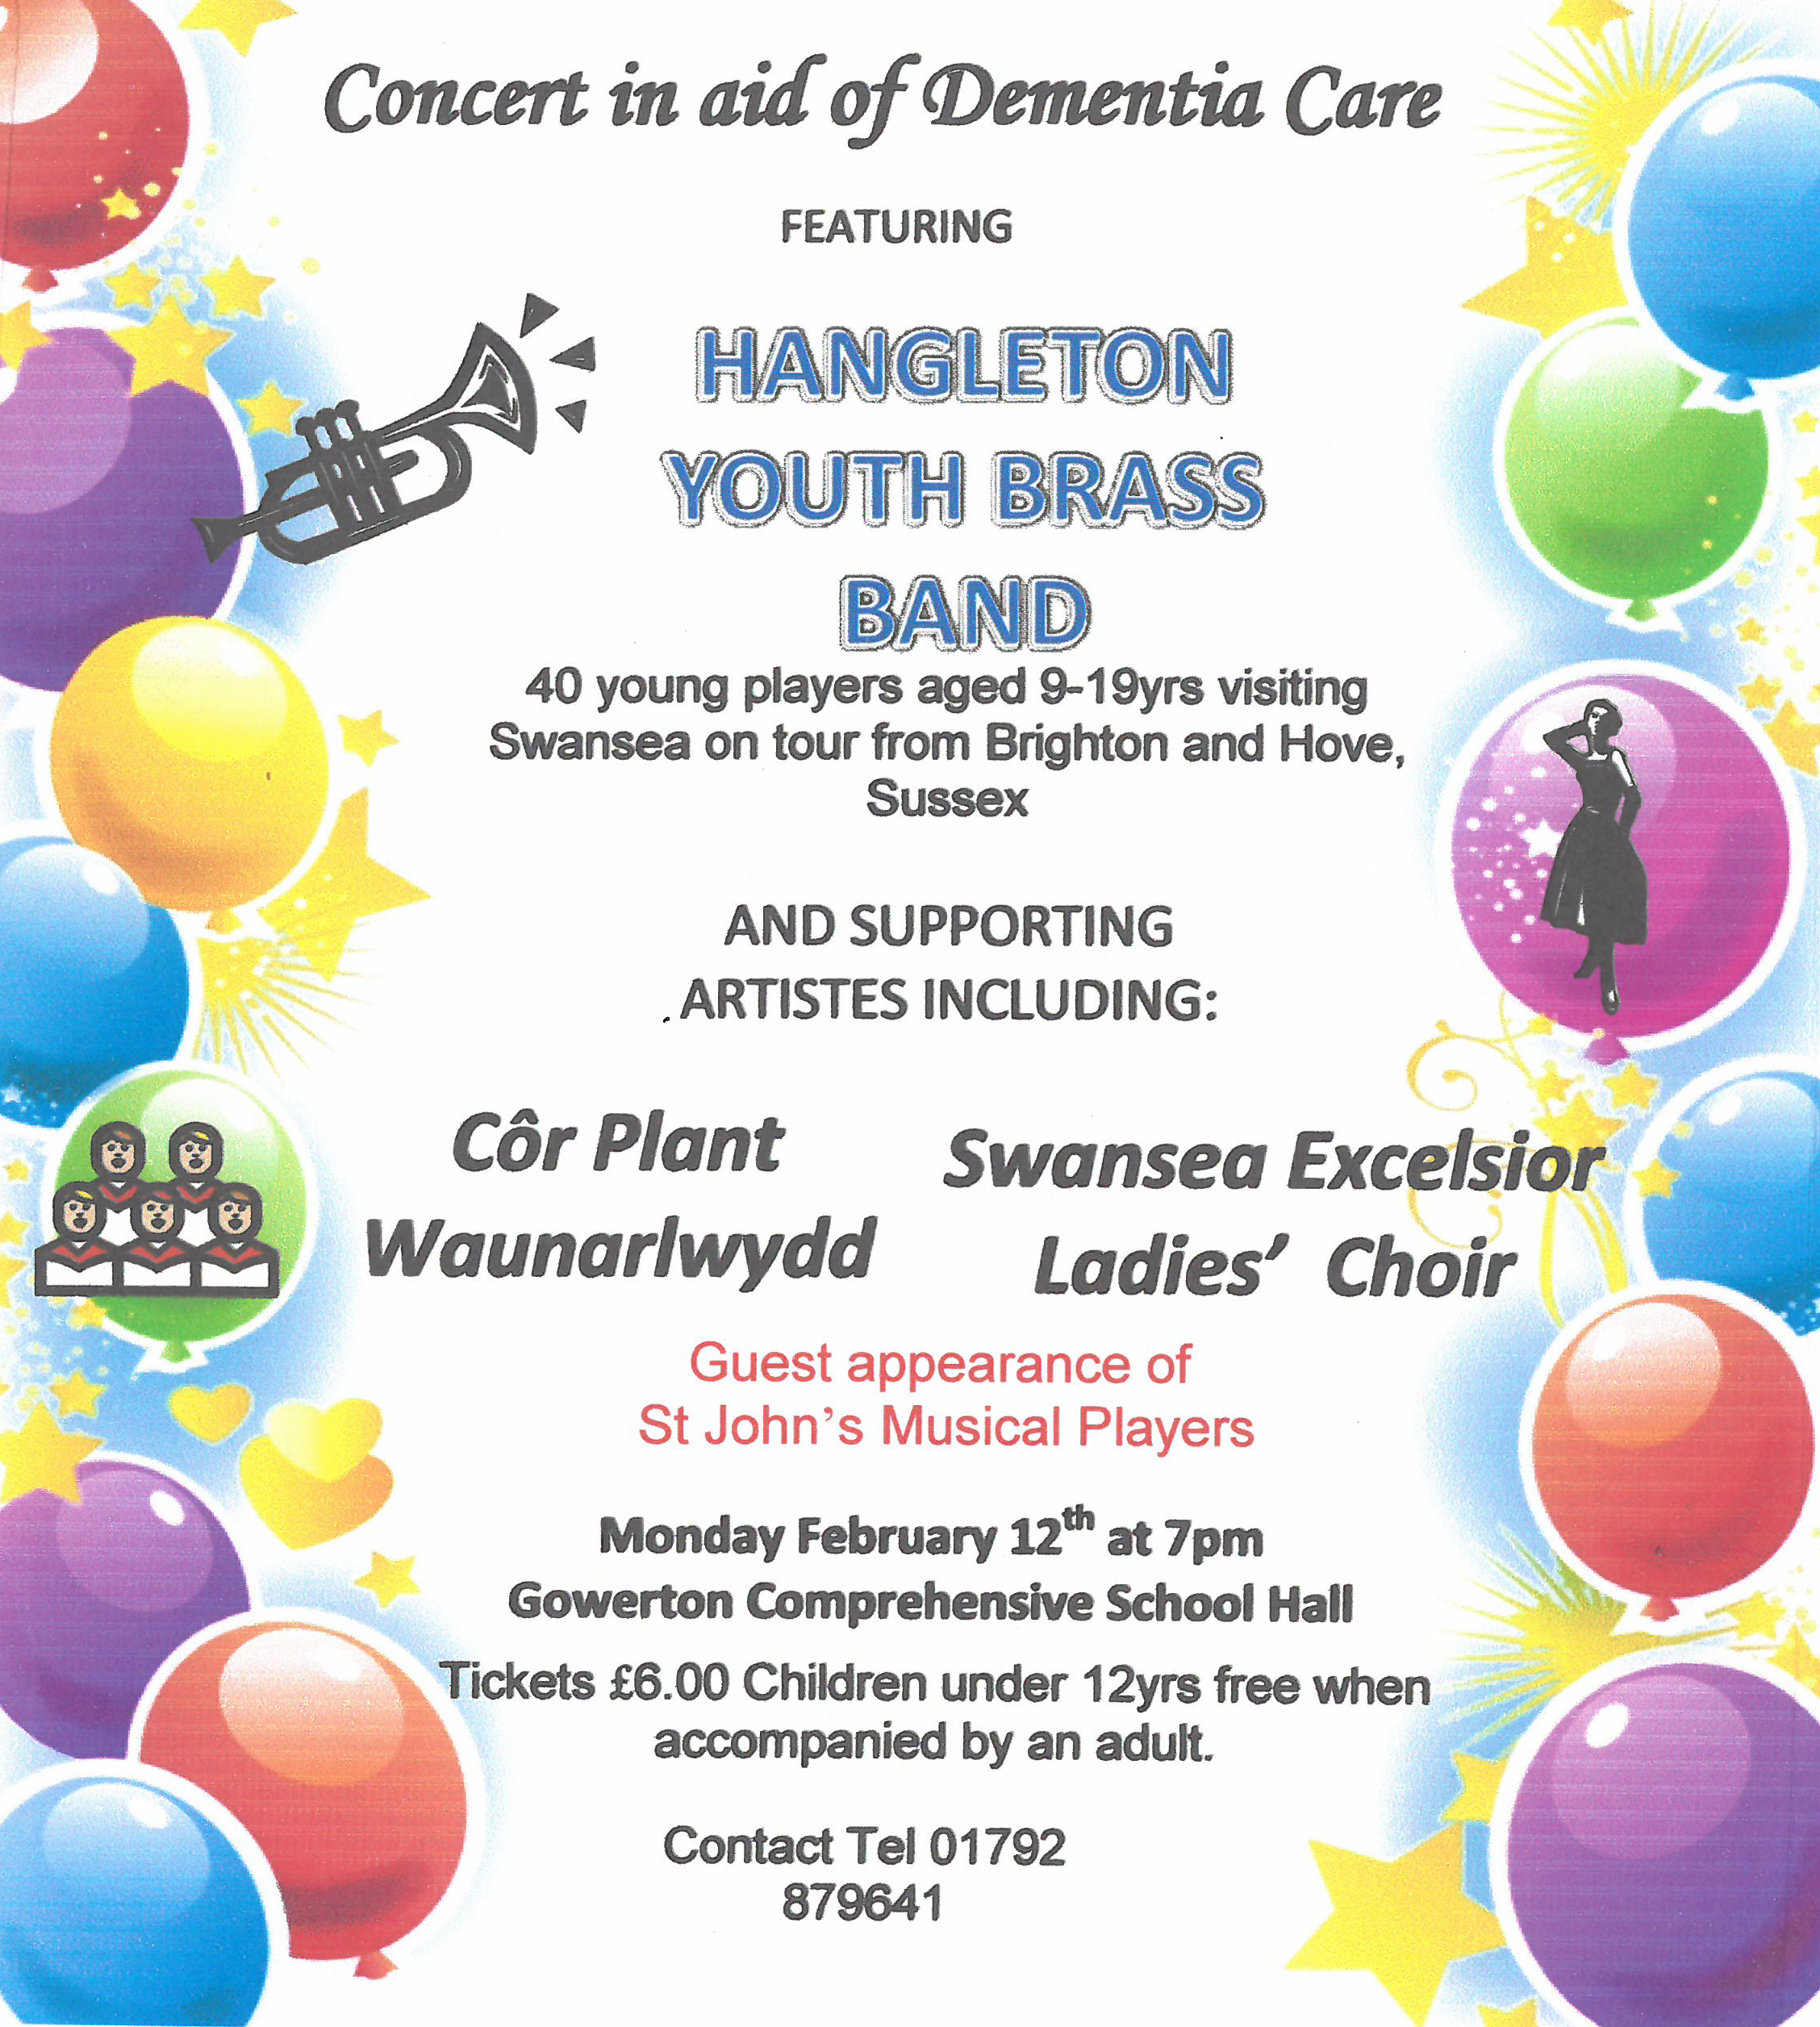 hangleton youth brass band